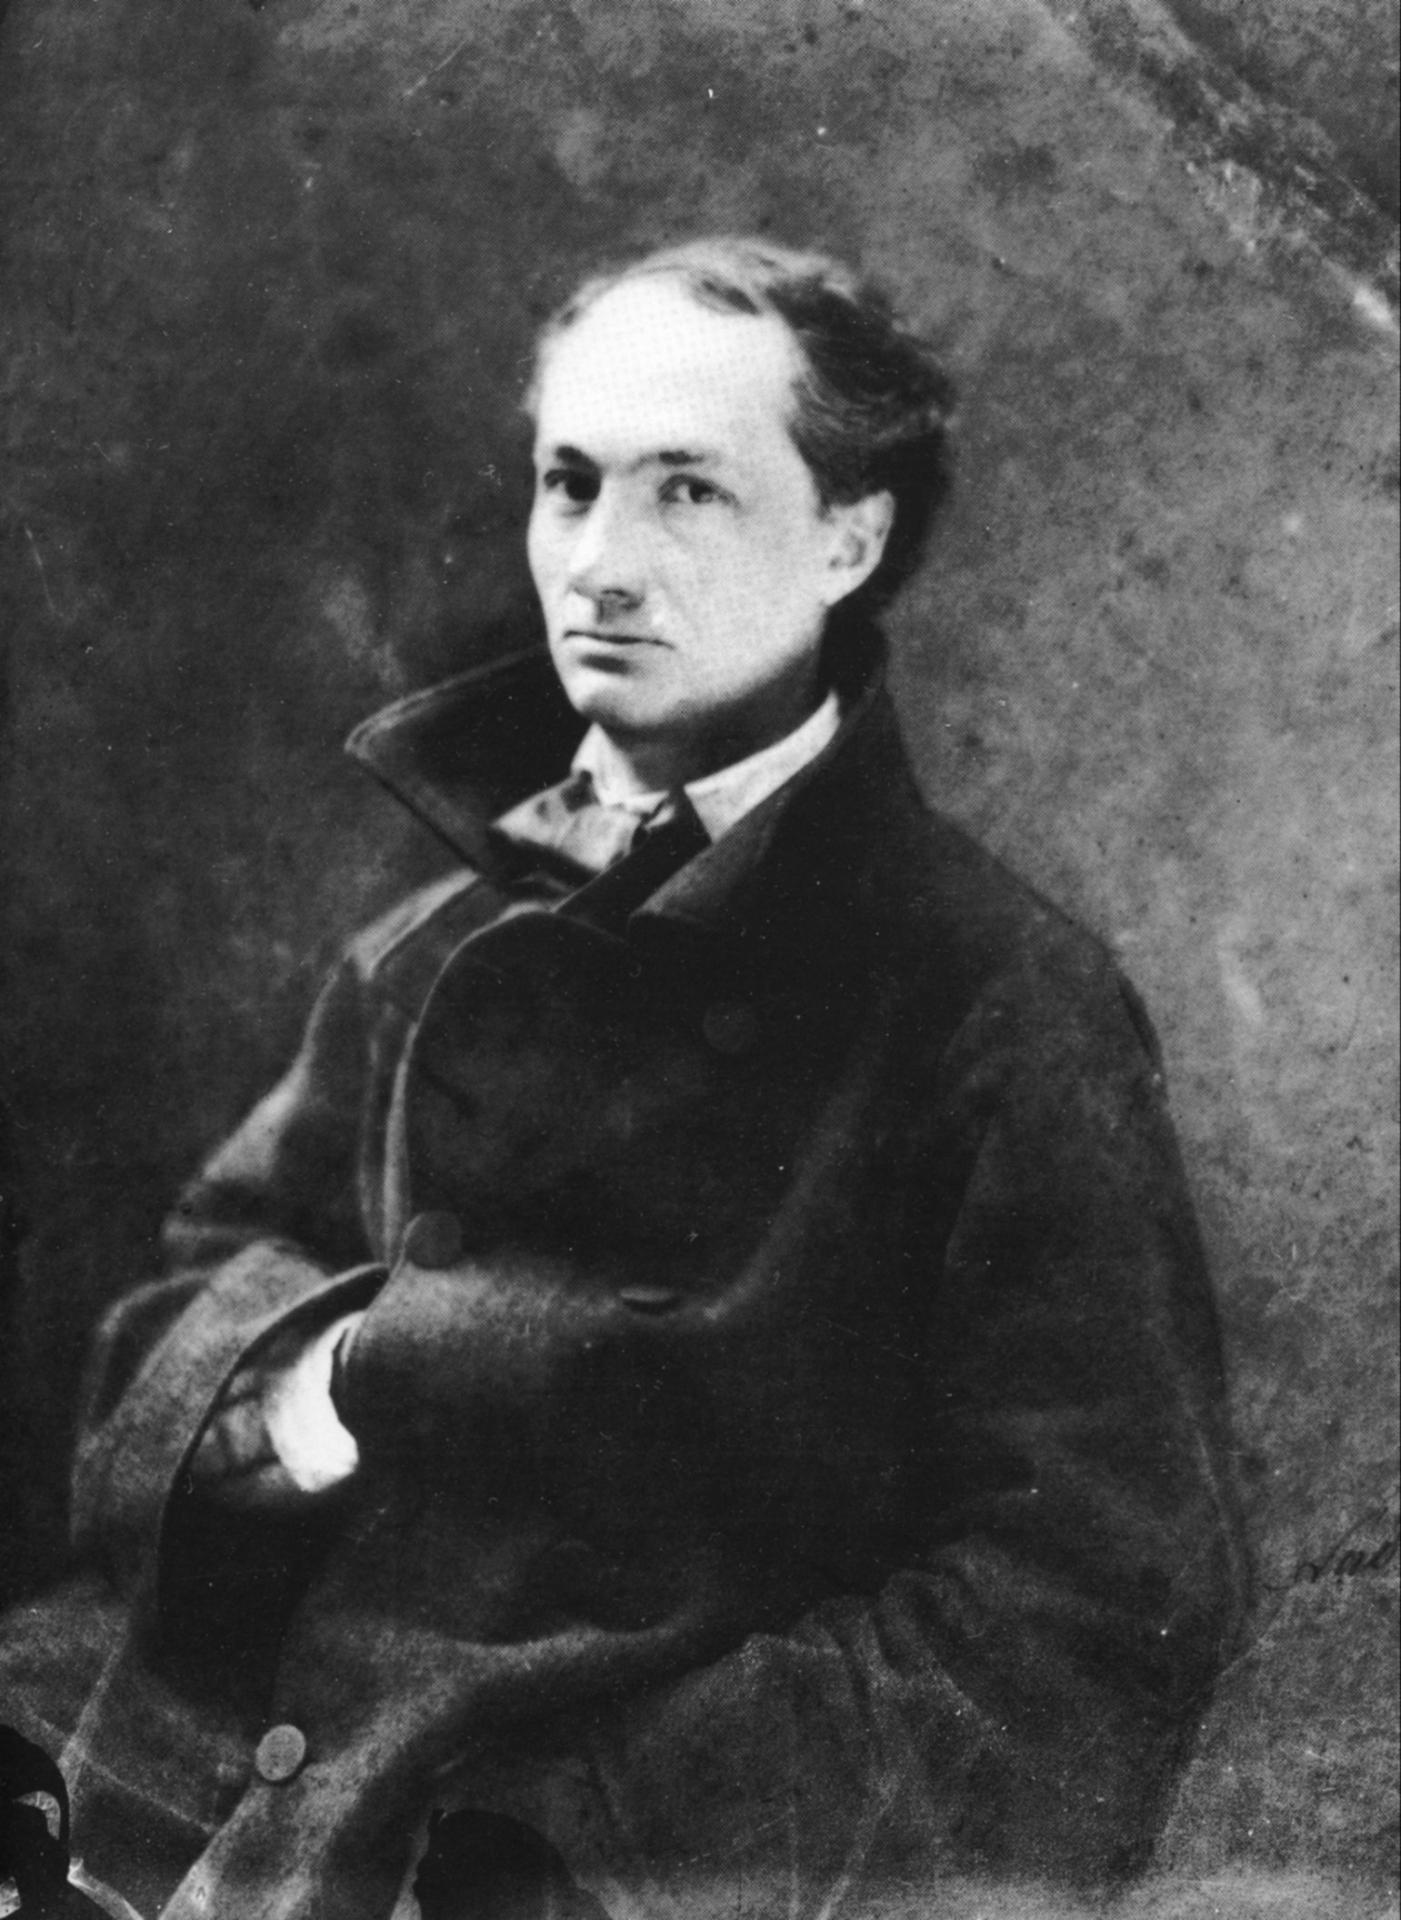 Charles baudelaire i